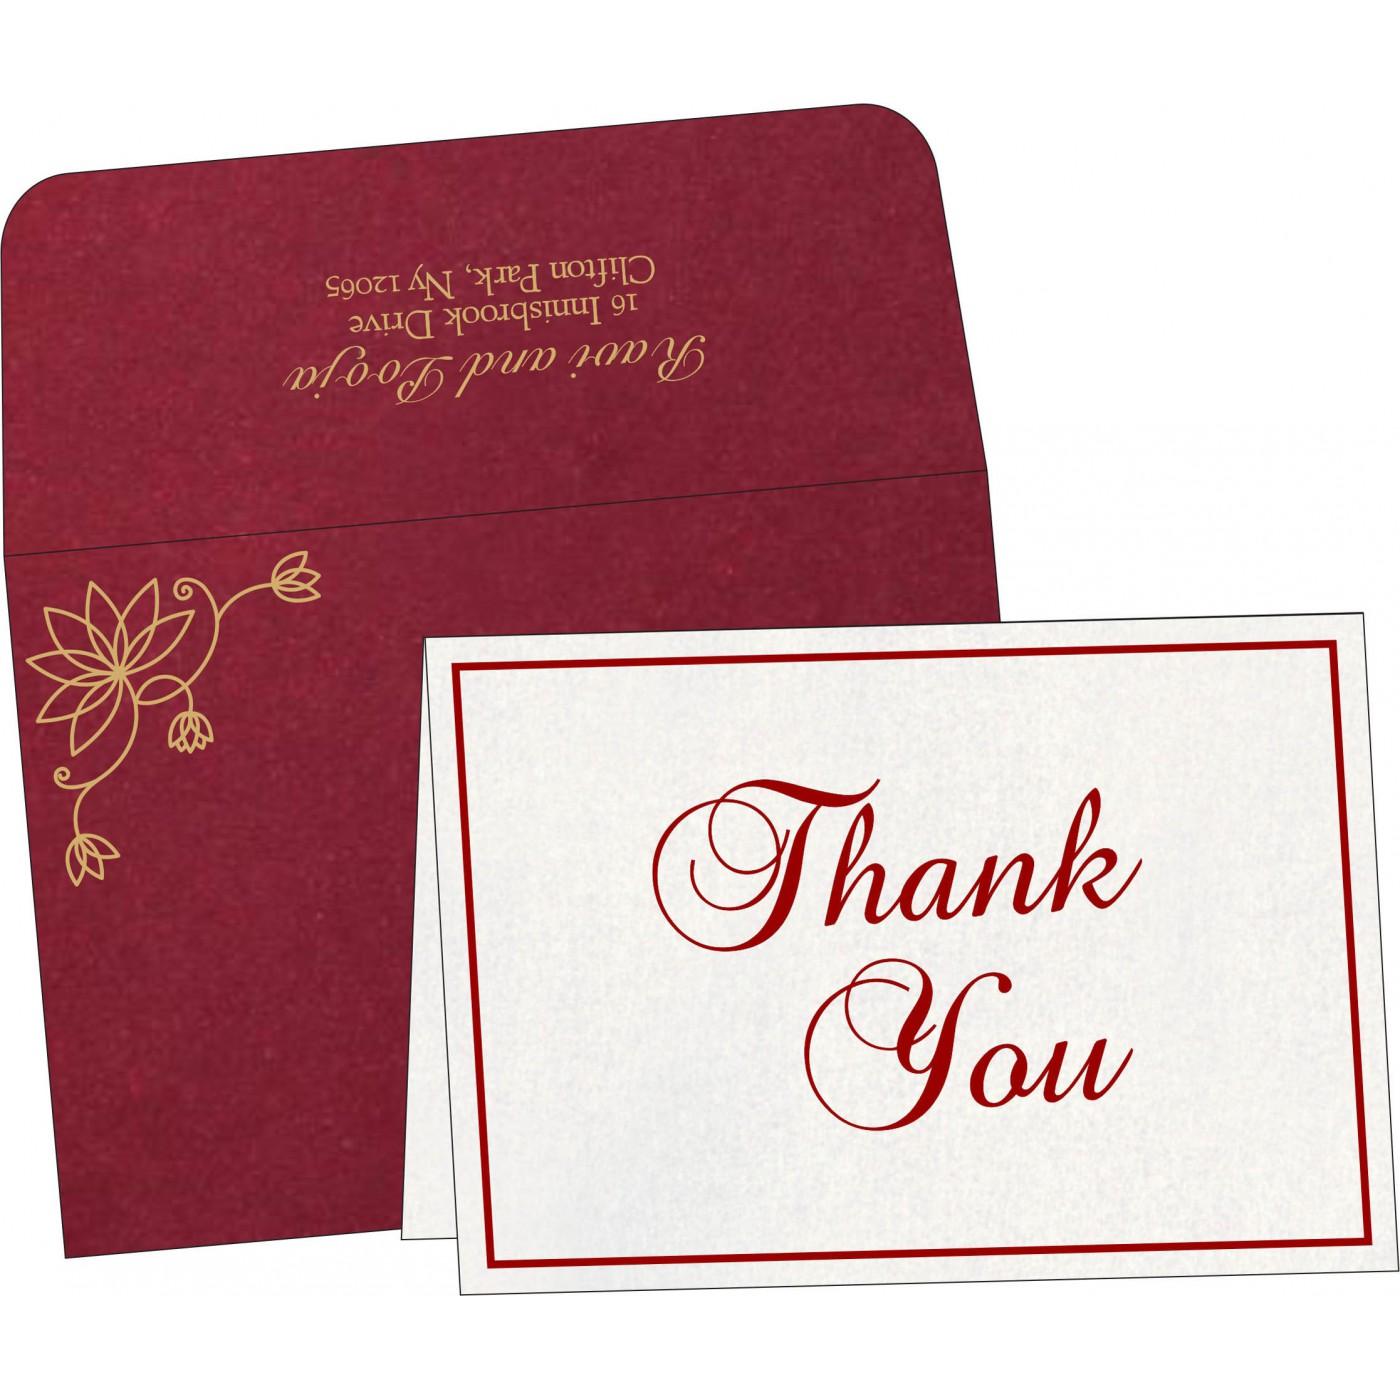 Thank You Cards : TYC-8251L - 123WeddingCards